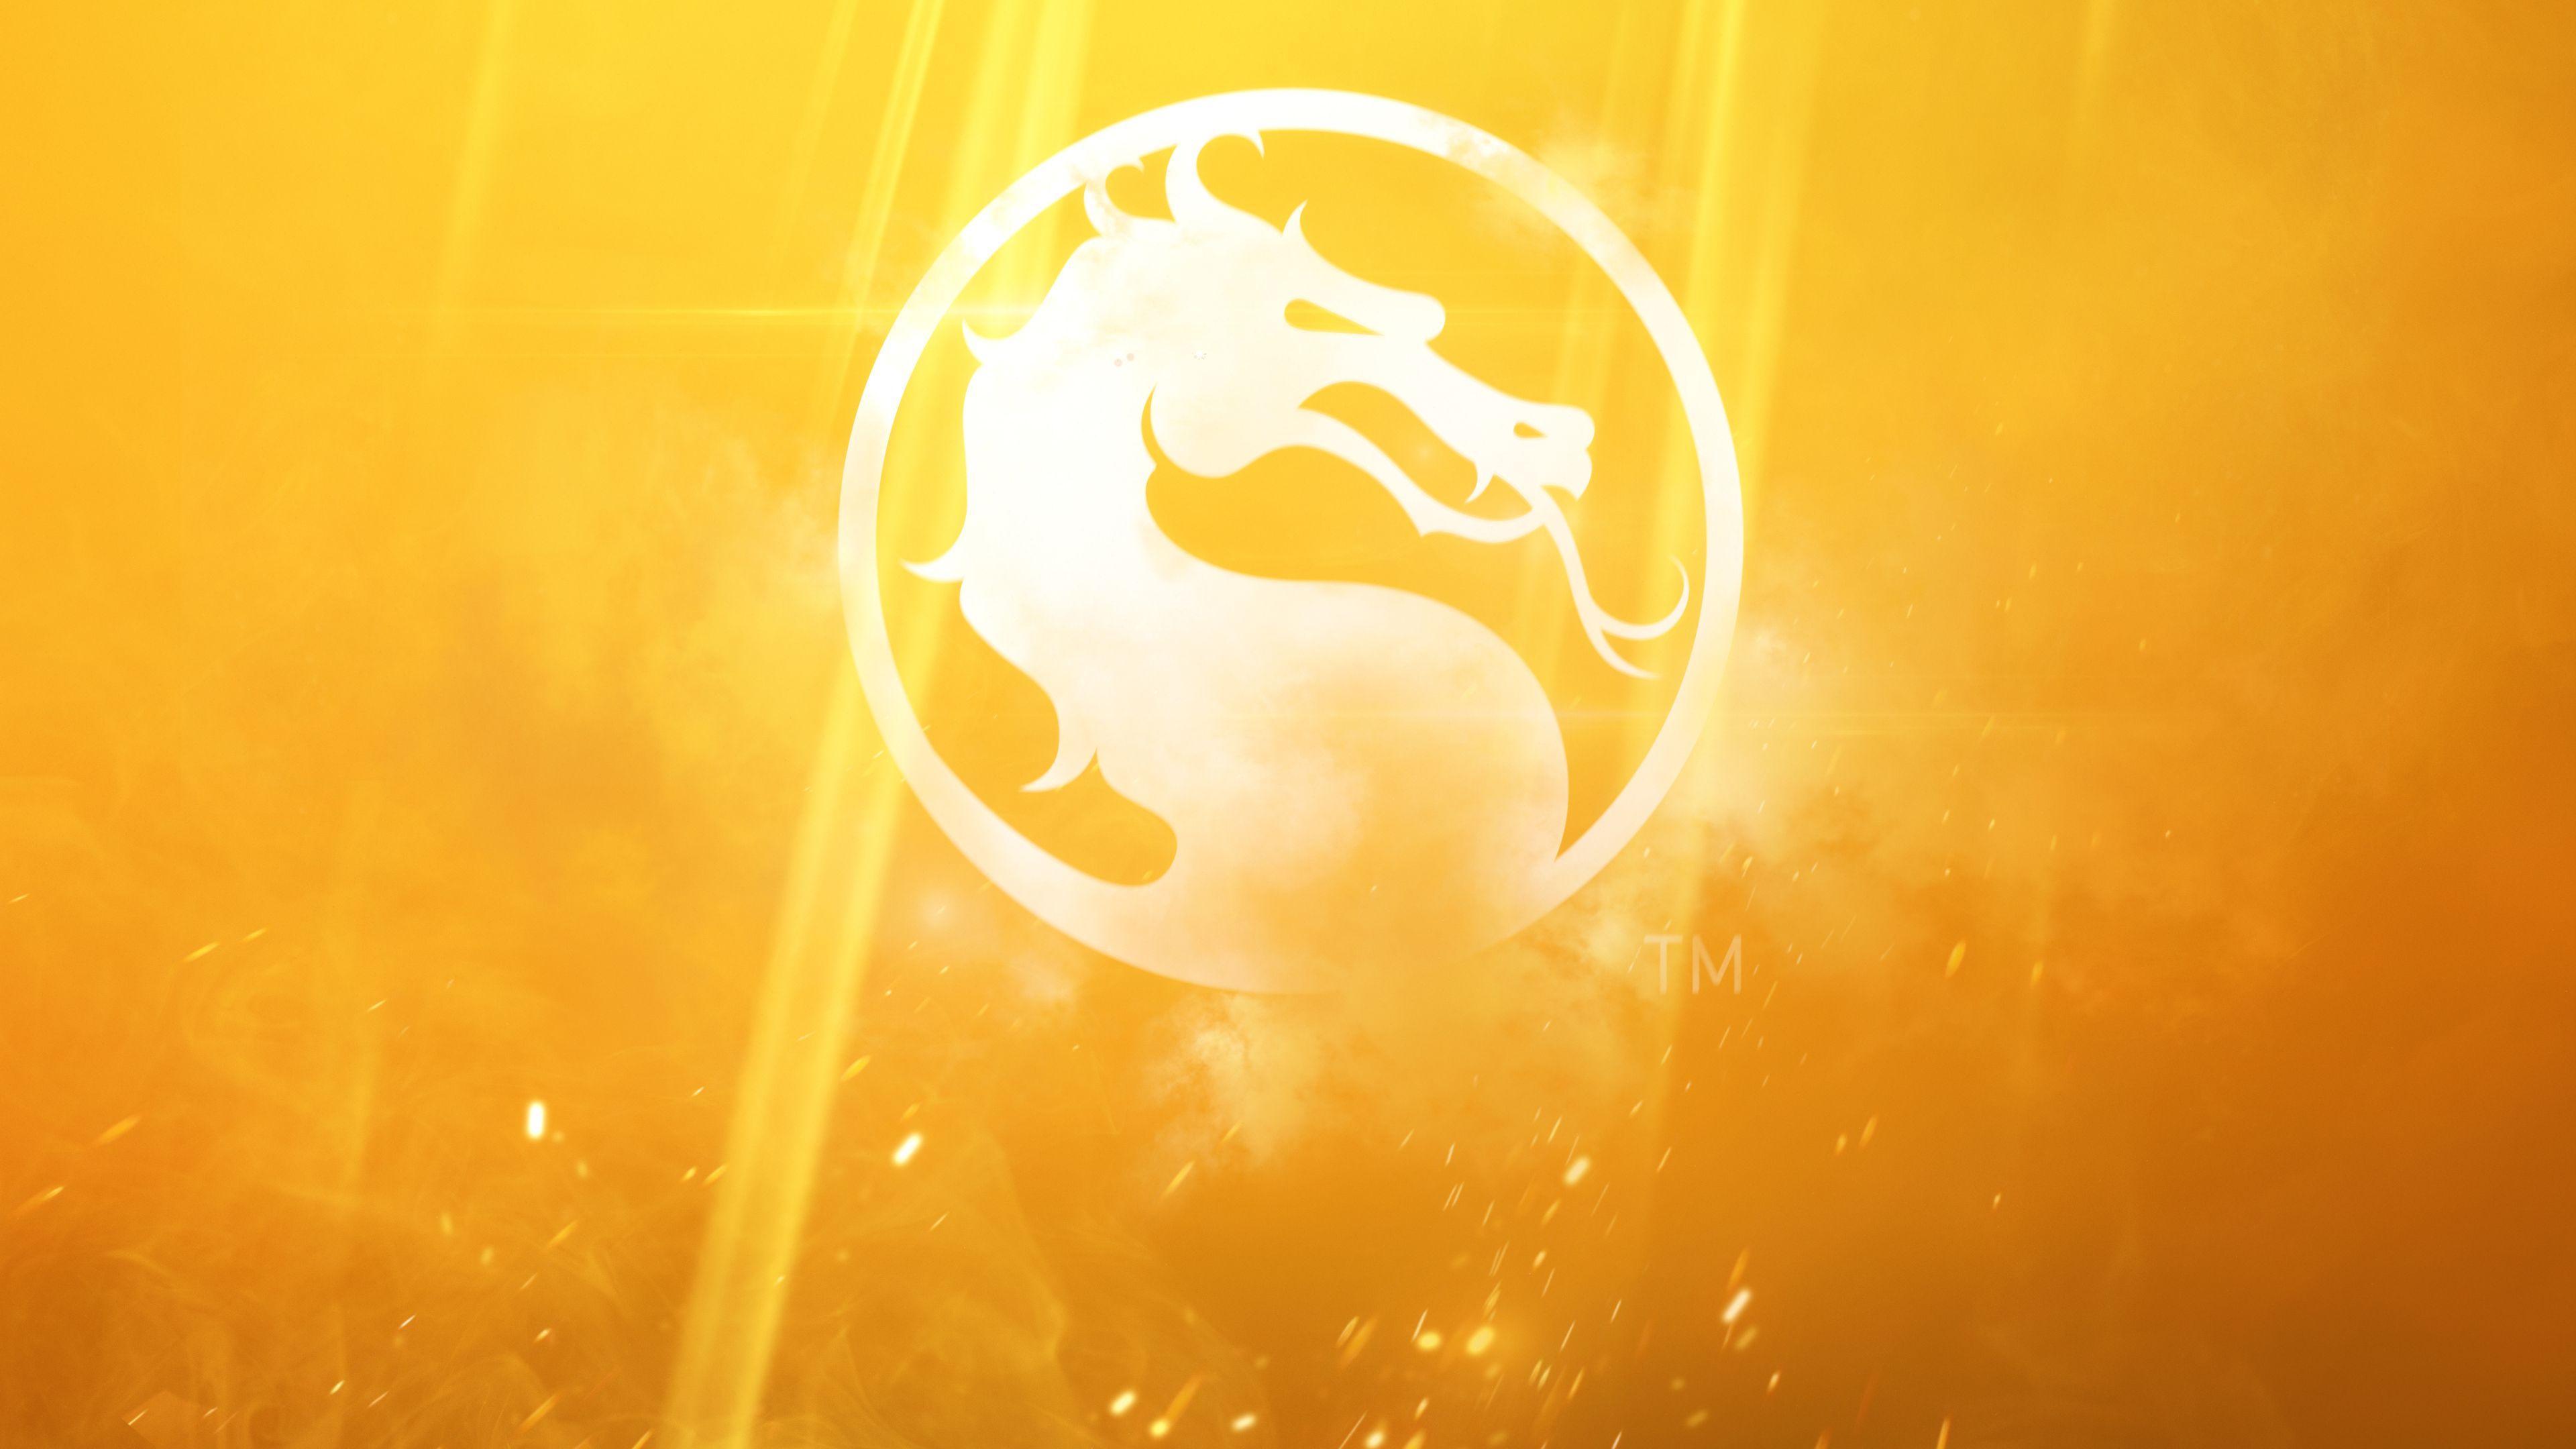 Mortal Kombat 11 4k Wallpapers Top Free Mortal Kombat 11 4k Backgrounds Wallpaperaccess